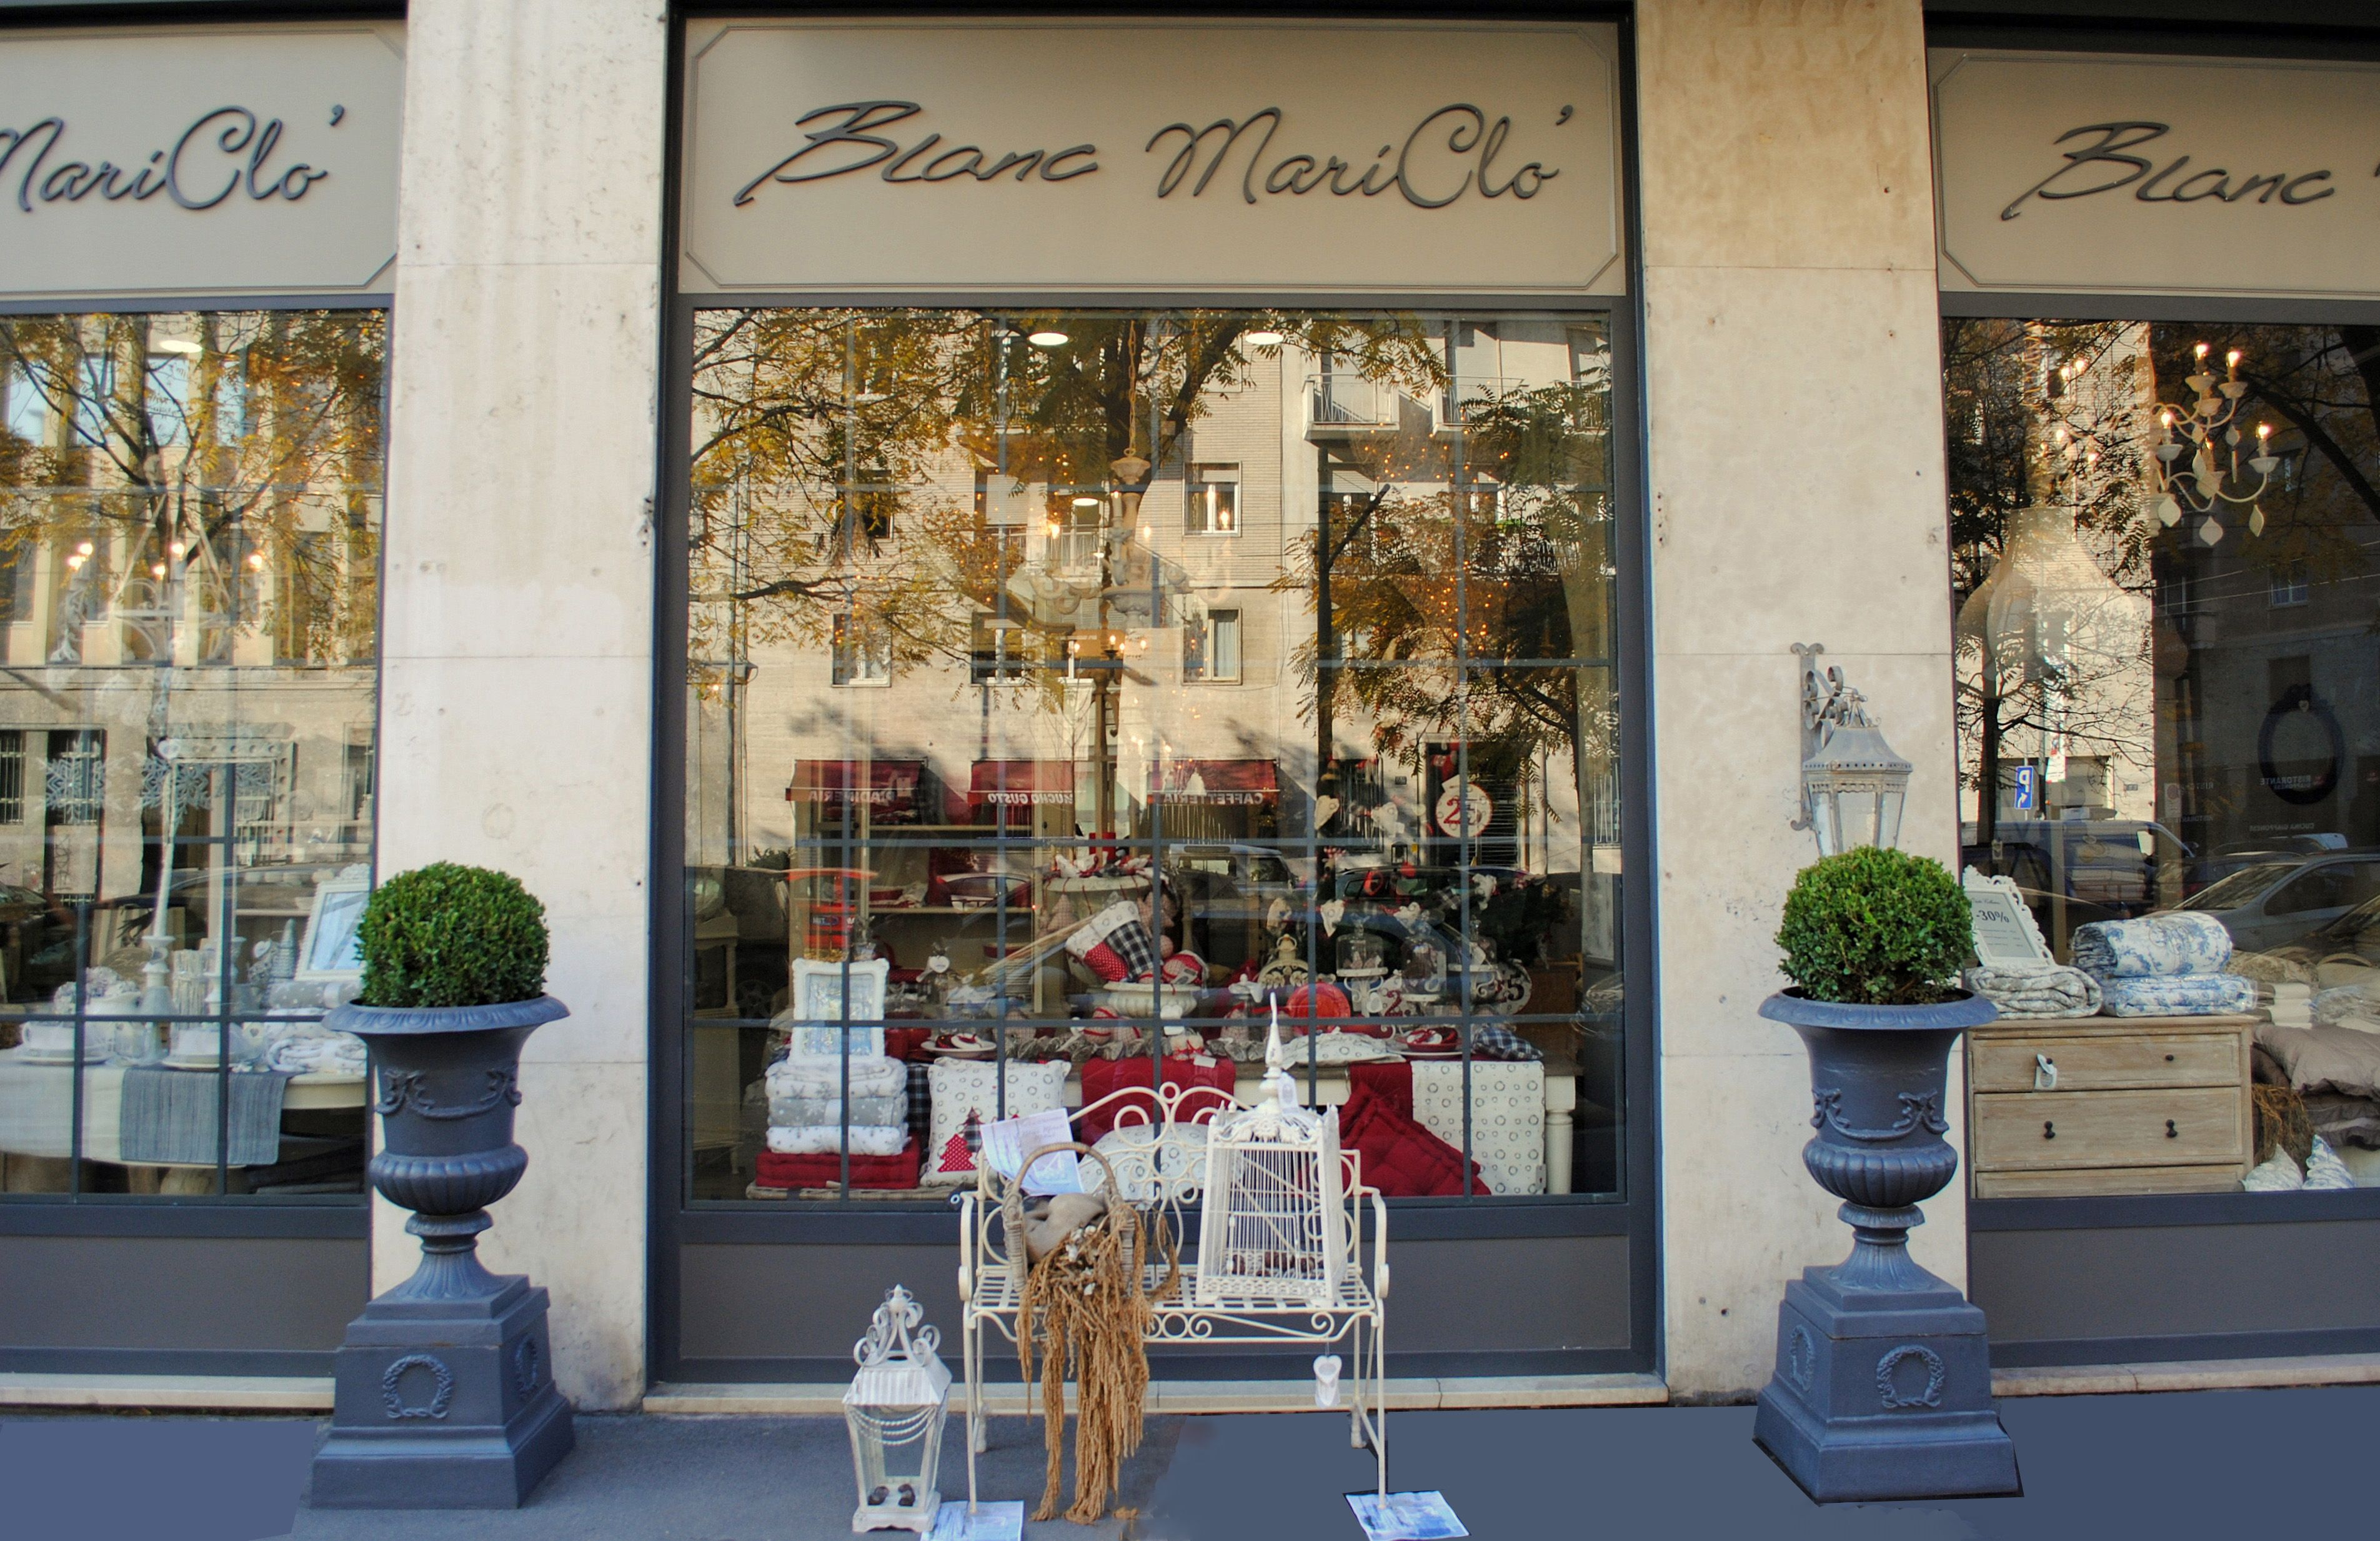 Il Natale Blanc Mariclò a Milano   Shabby Chic Mania by Grazia ...